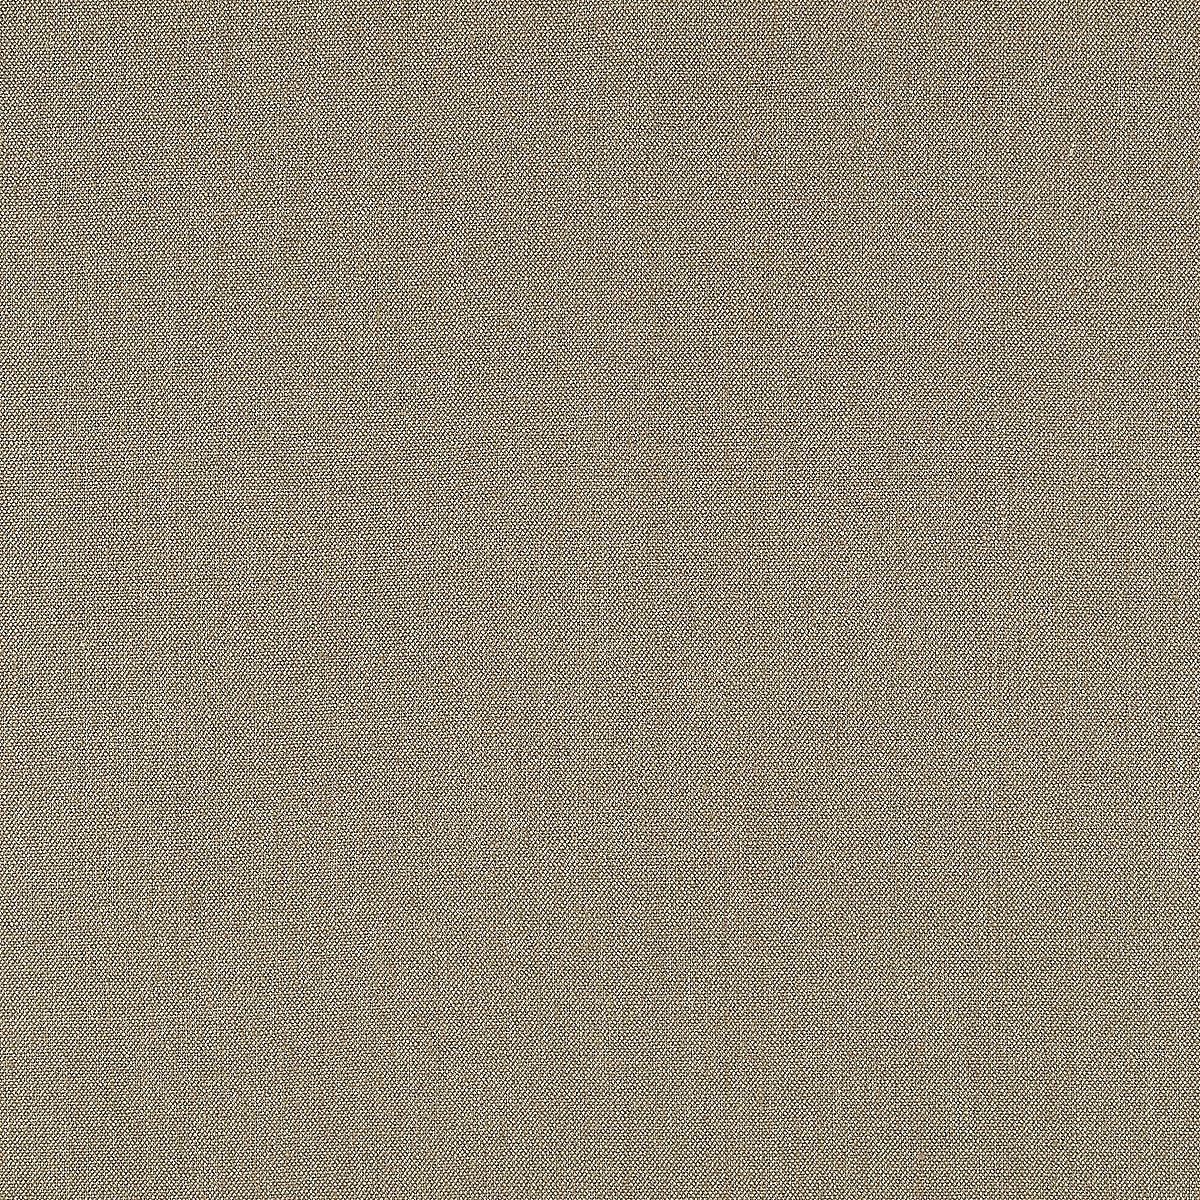 Belgian Linen: Bark (fabric yardage)